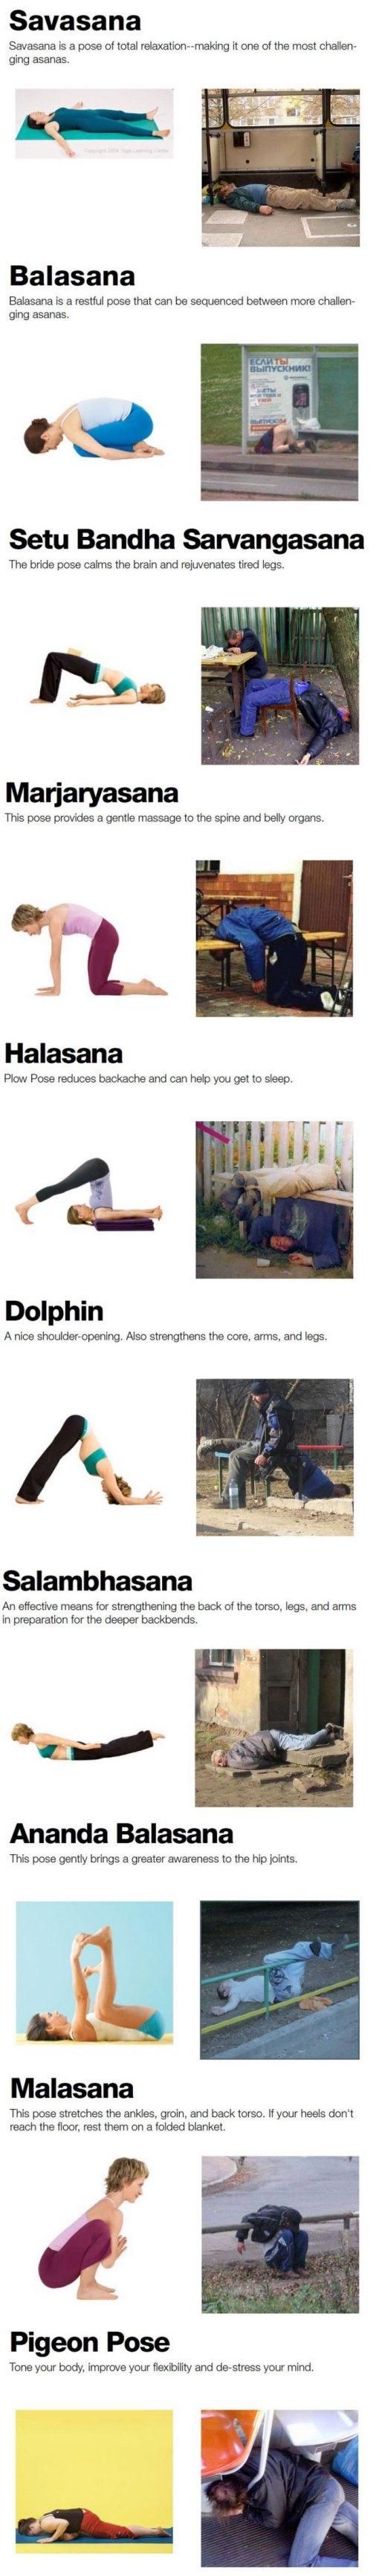 russian-yoga2.jpg